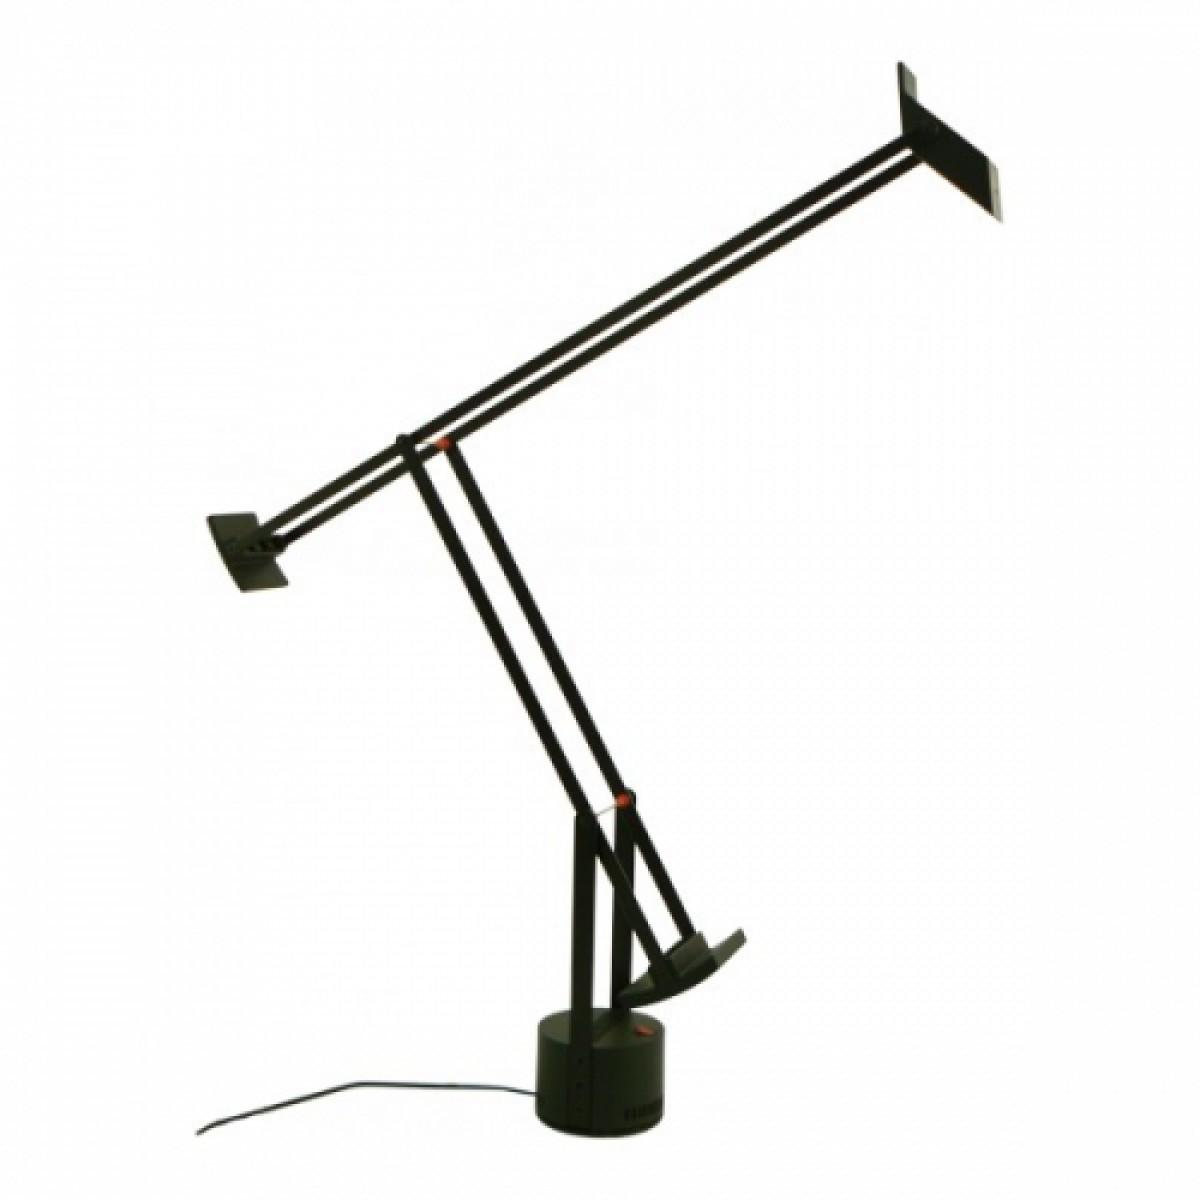 Artemide Tizio Table Lamp | Deplain.com